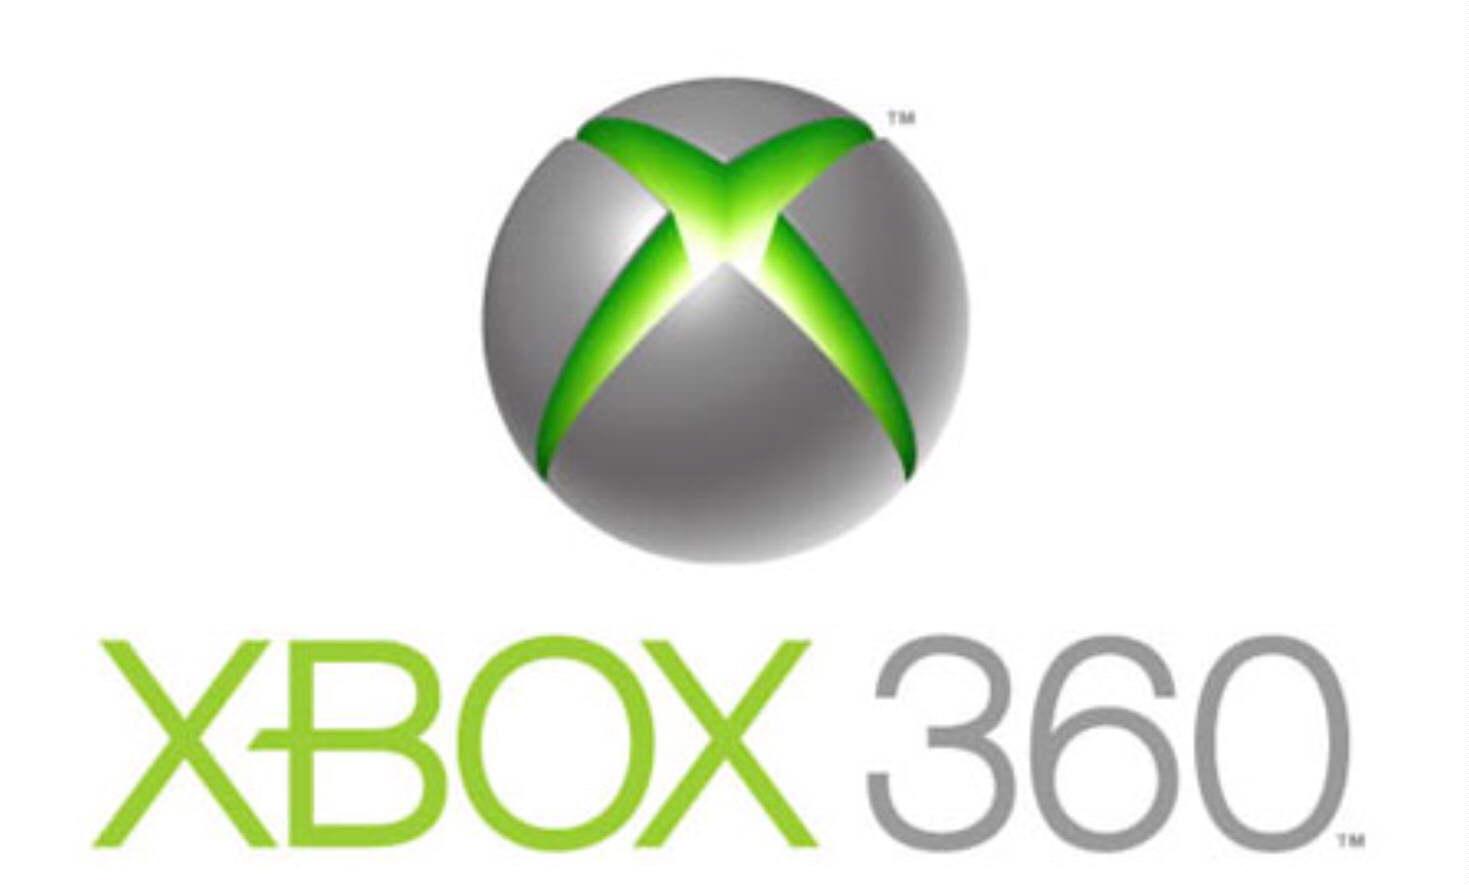 Xbox 360 Logo Black Xbox 360